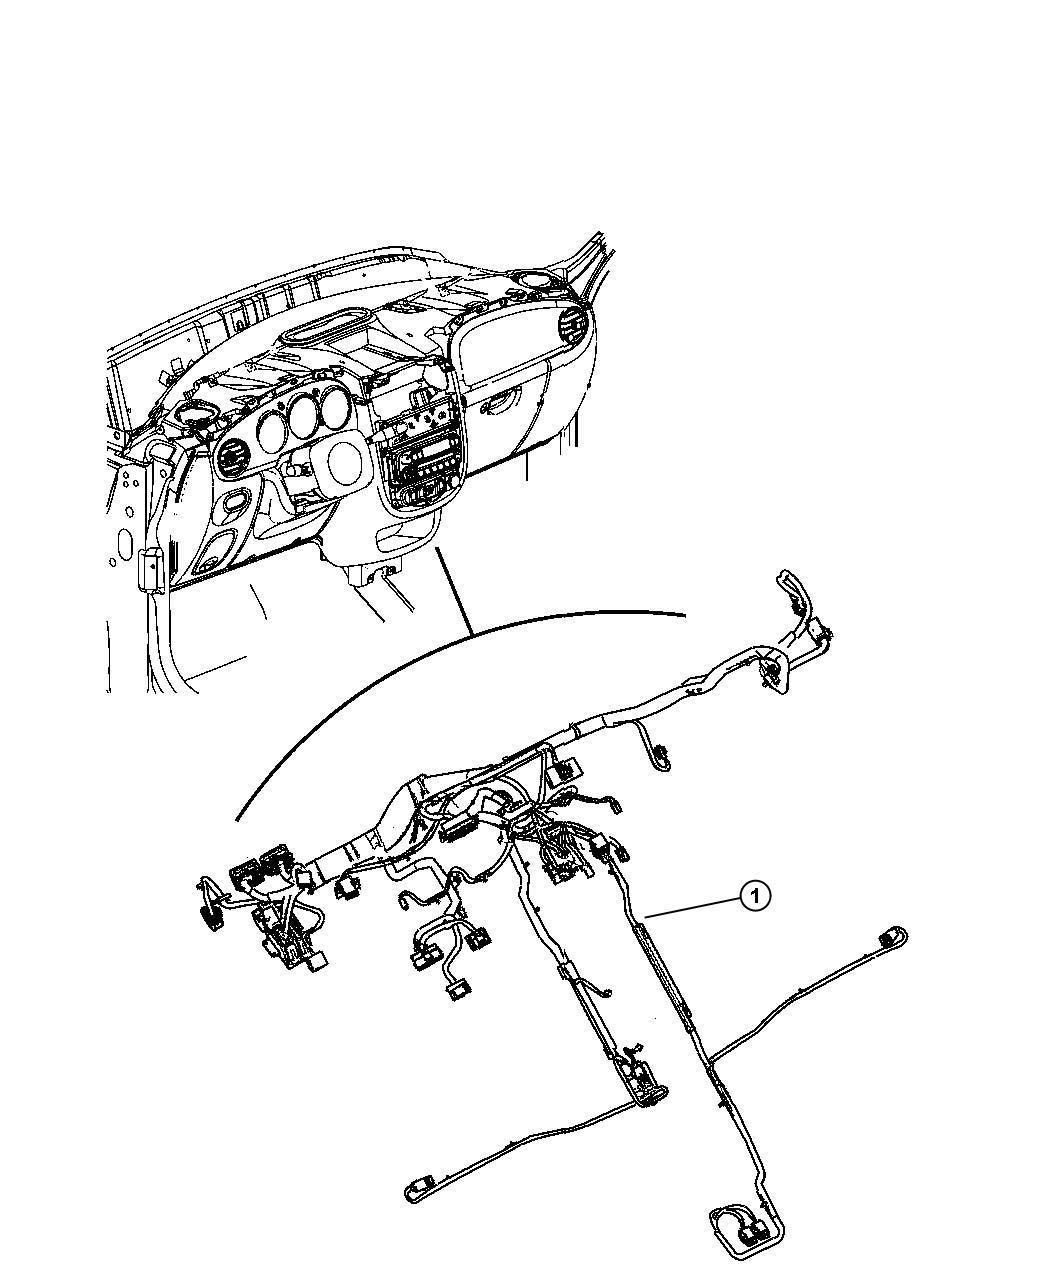 chrysler pt cruiser wiring  instrument panel   rcd  rdd